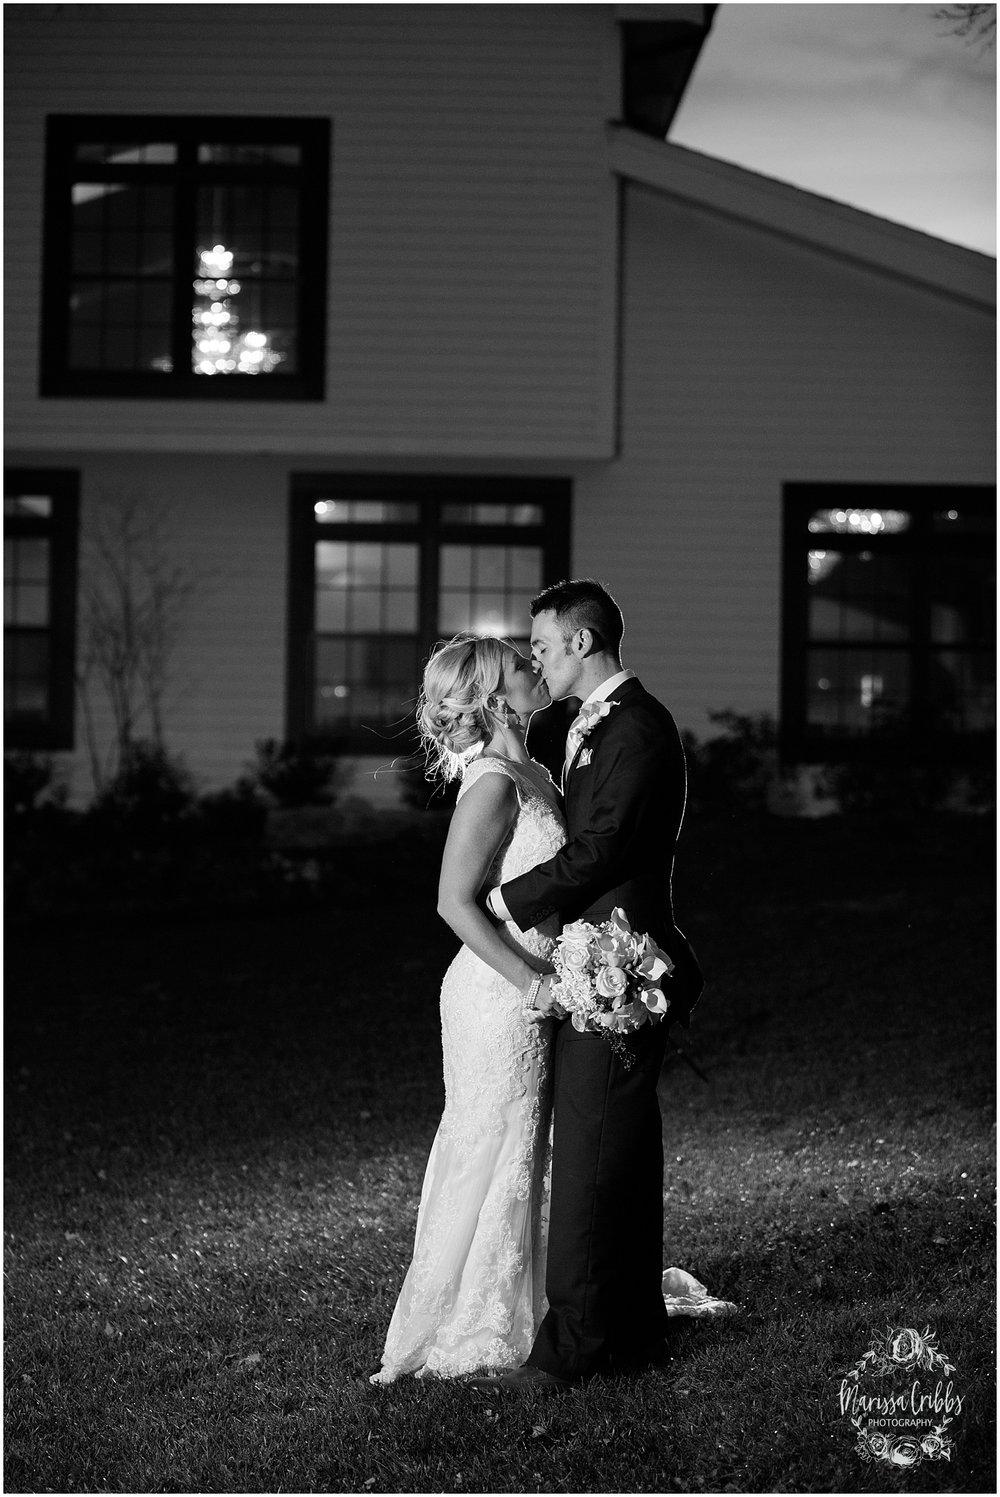 Alex & Amie | Eighteen Ninety Event Space | Marissa Cribbs Photography | Kansas City Perfect Wedding Guide_1366.jpg